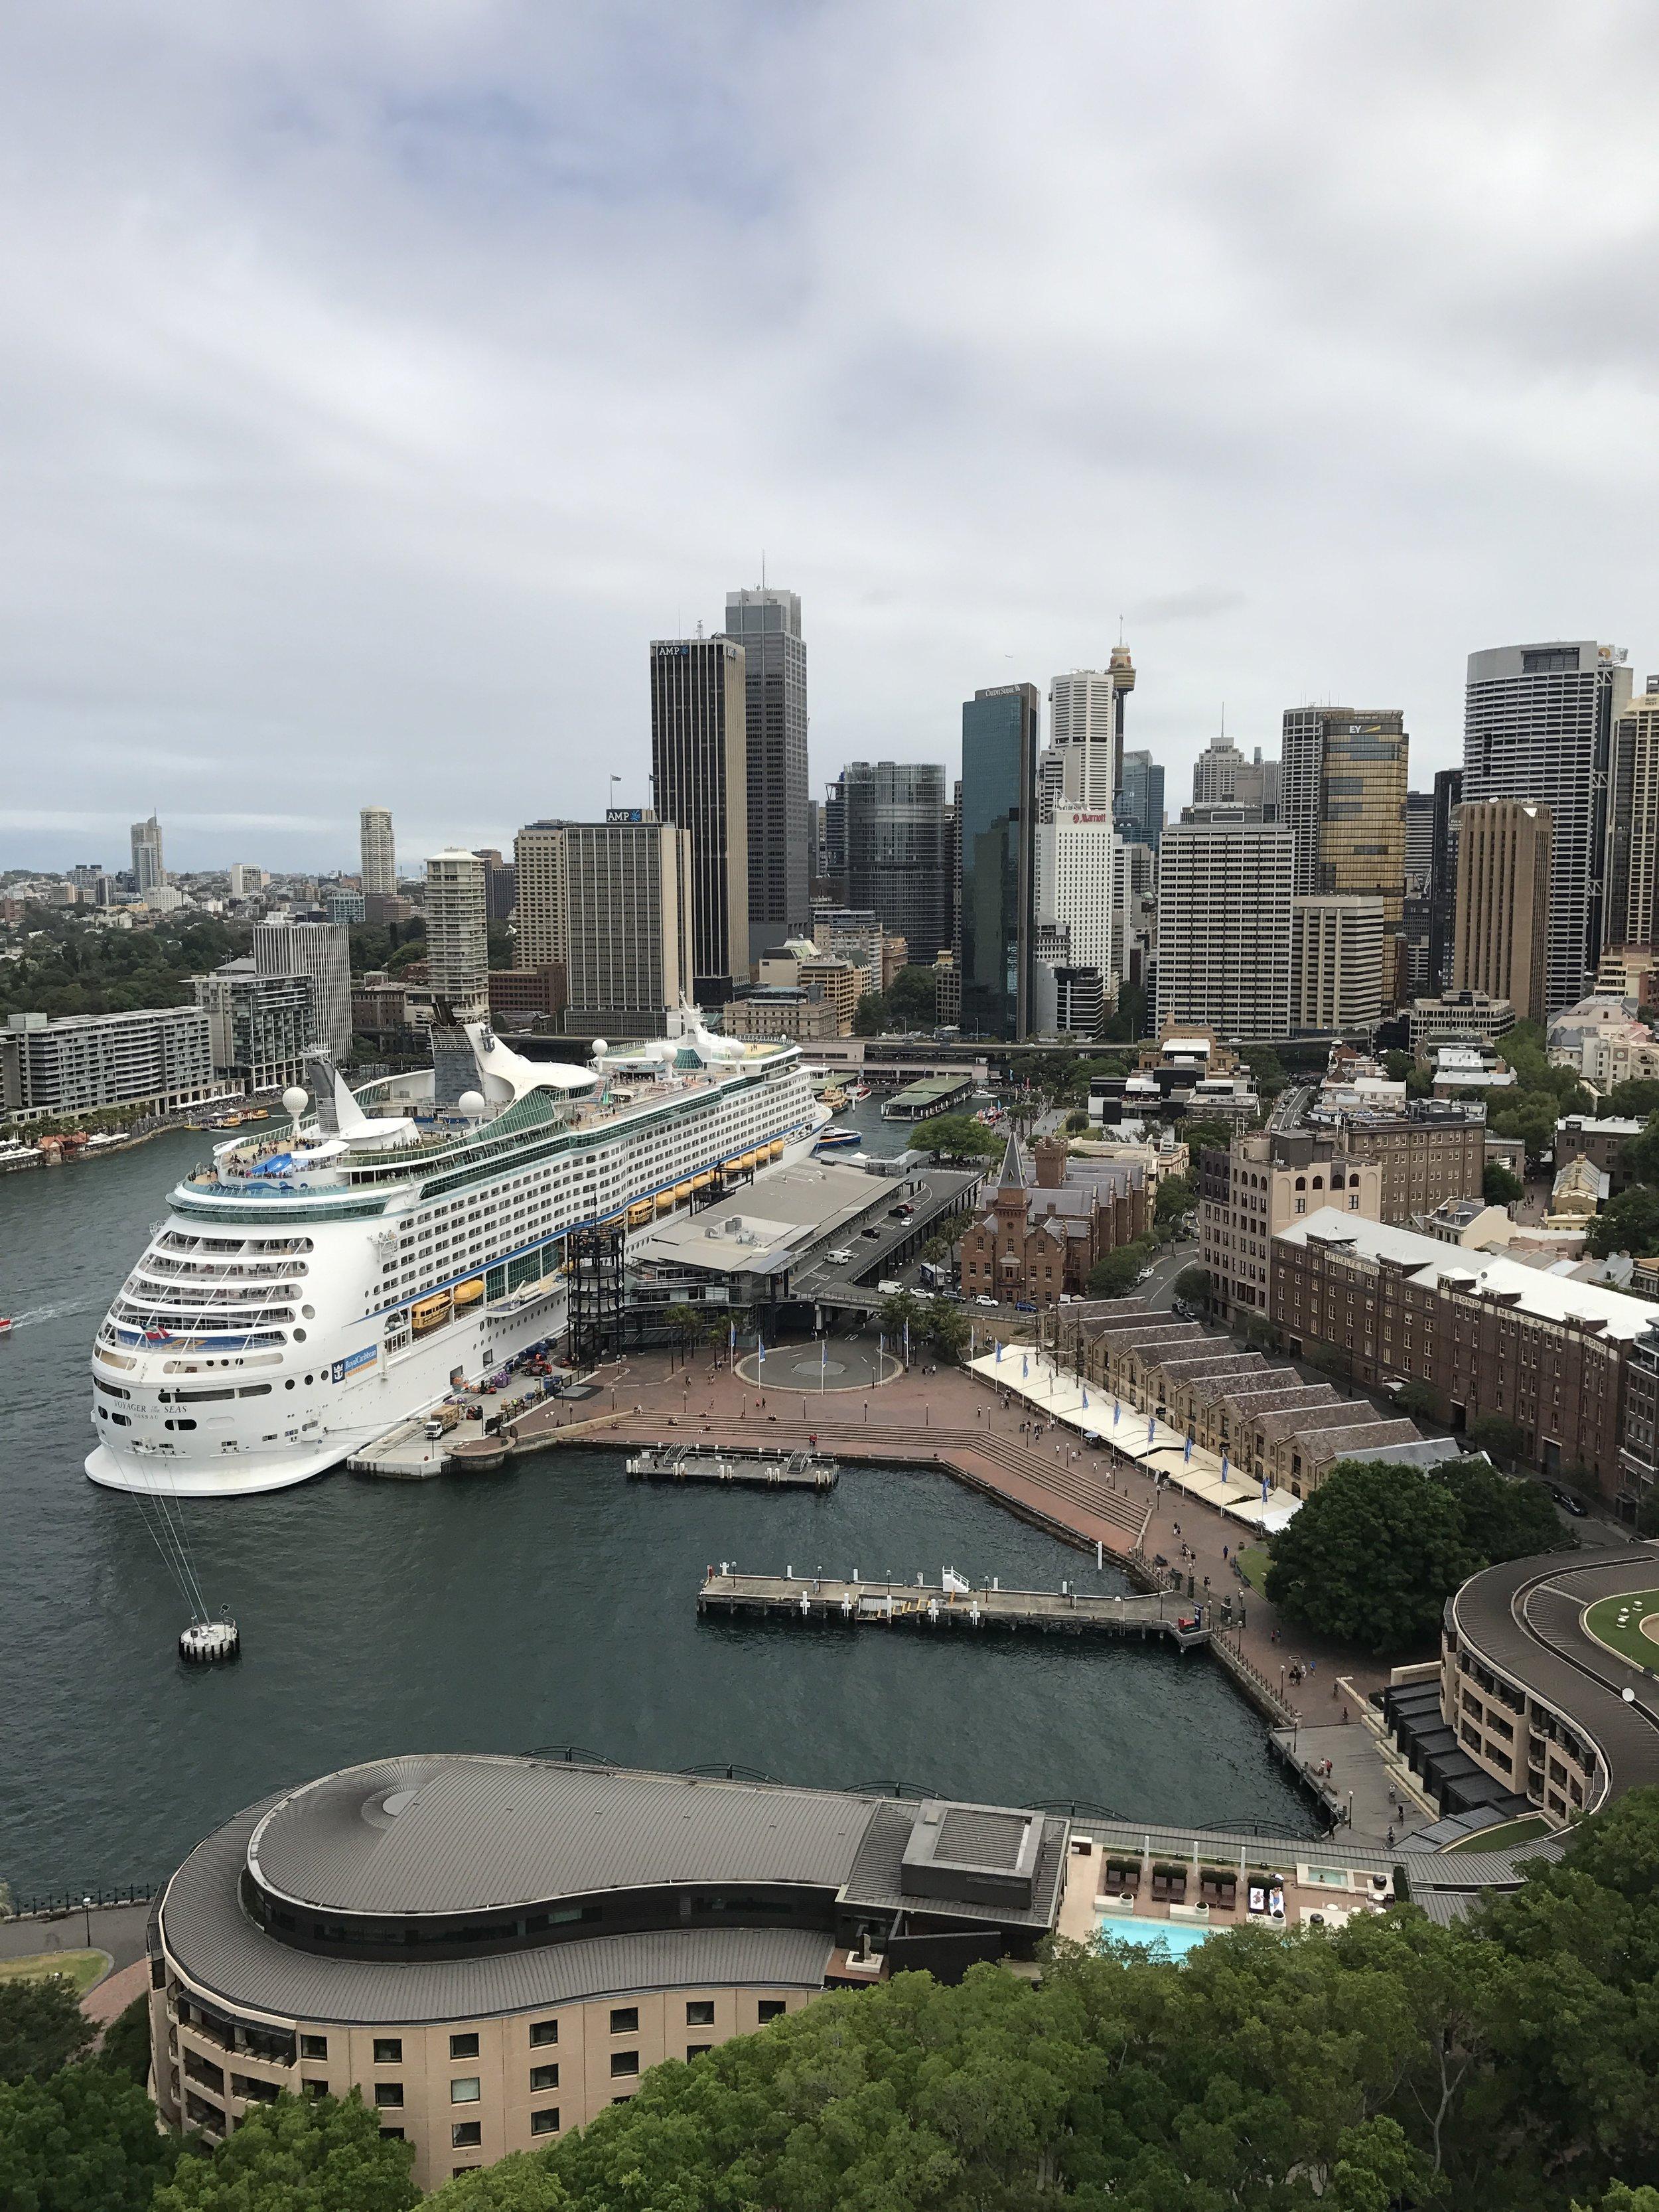 Circular Quay from the Sydney Harbour bridge